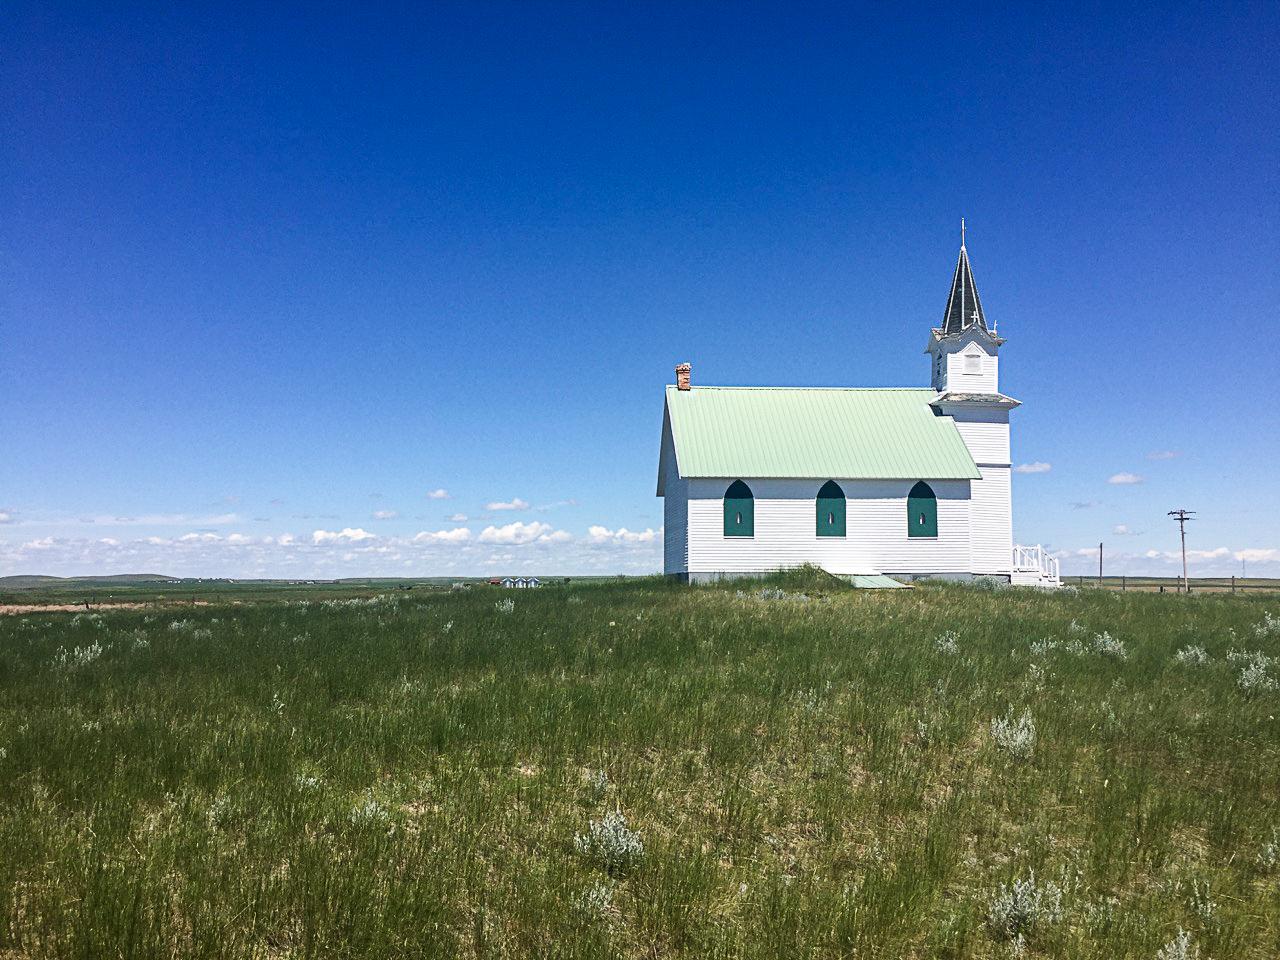 Scandia Lutheran Church near Malta, Montana